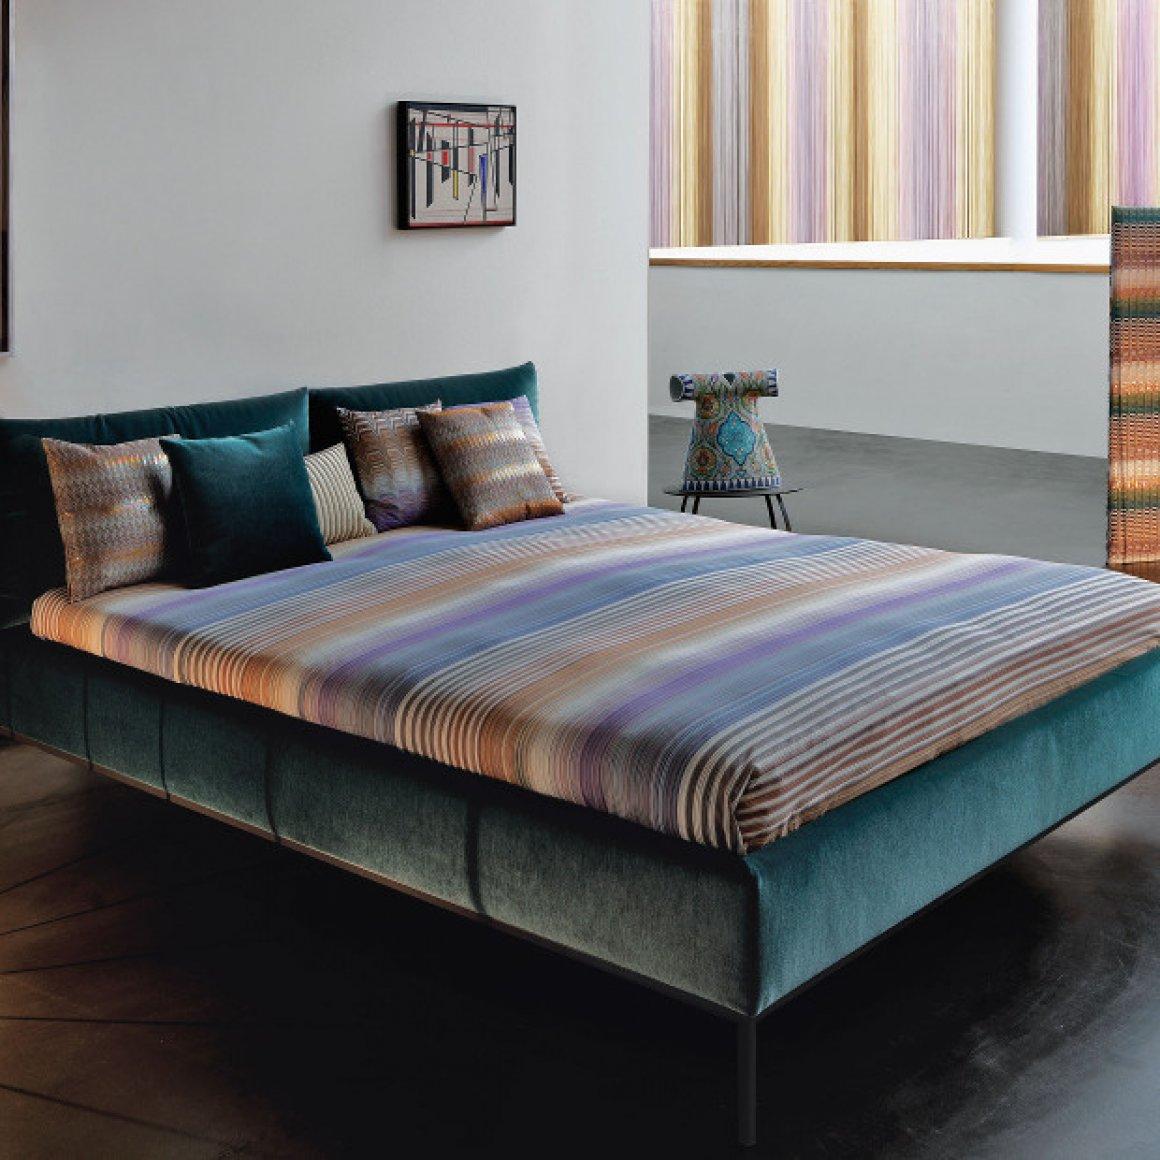 Copripiumino Missoni.Bed Linen Luxury Living